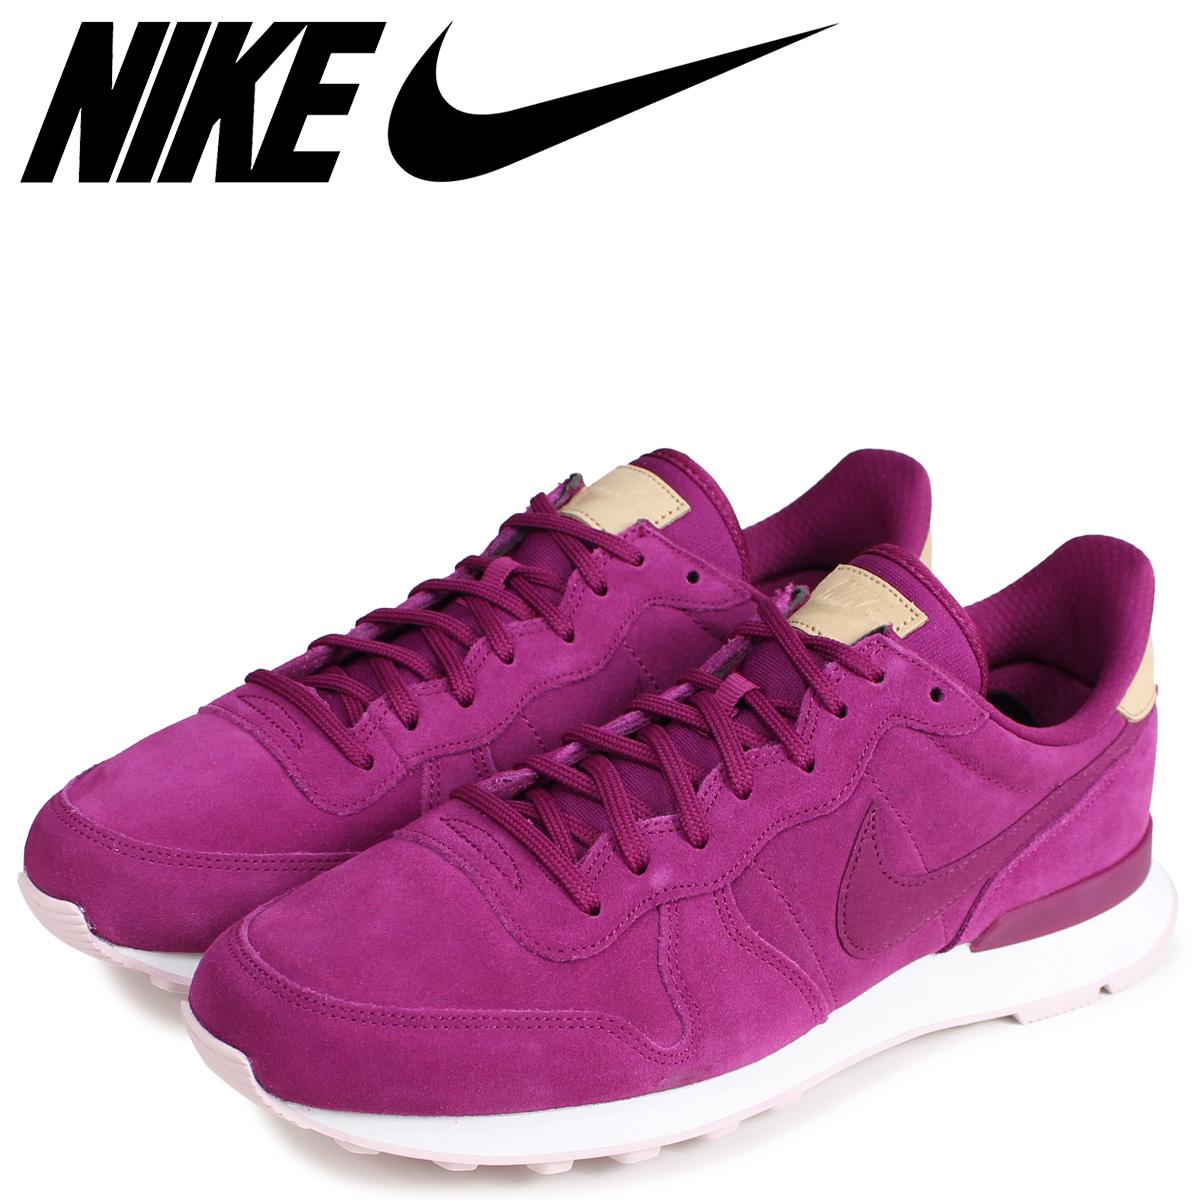 935c93f9464c NIKE Nike internationalist sneakers men WMNS INTERNATIONALIST PREMIUM  purple 828